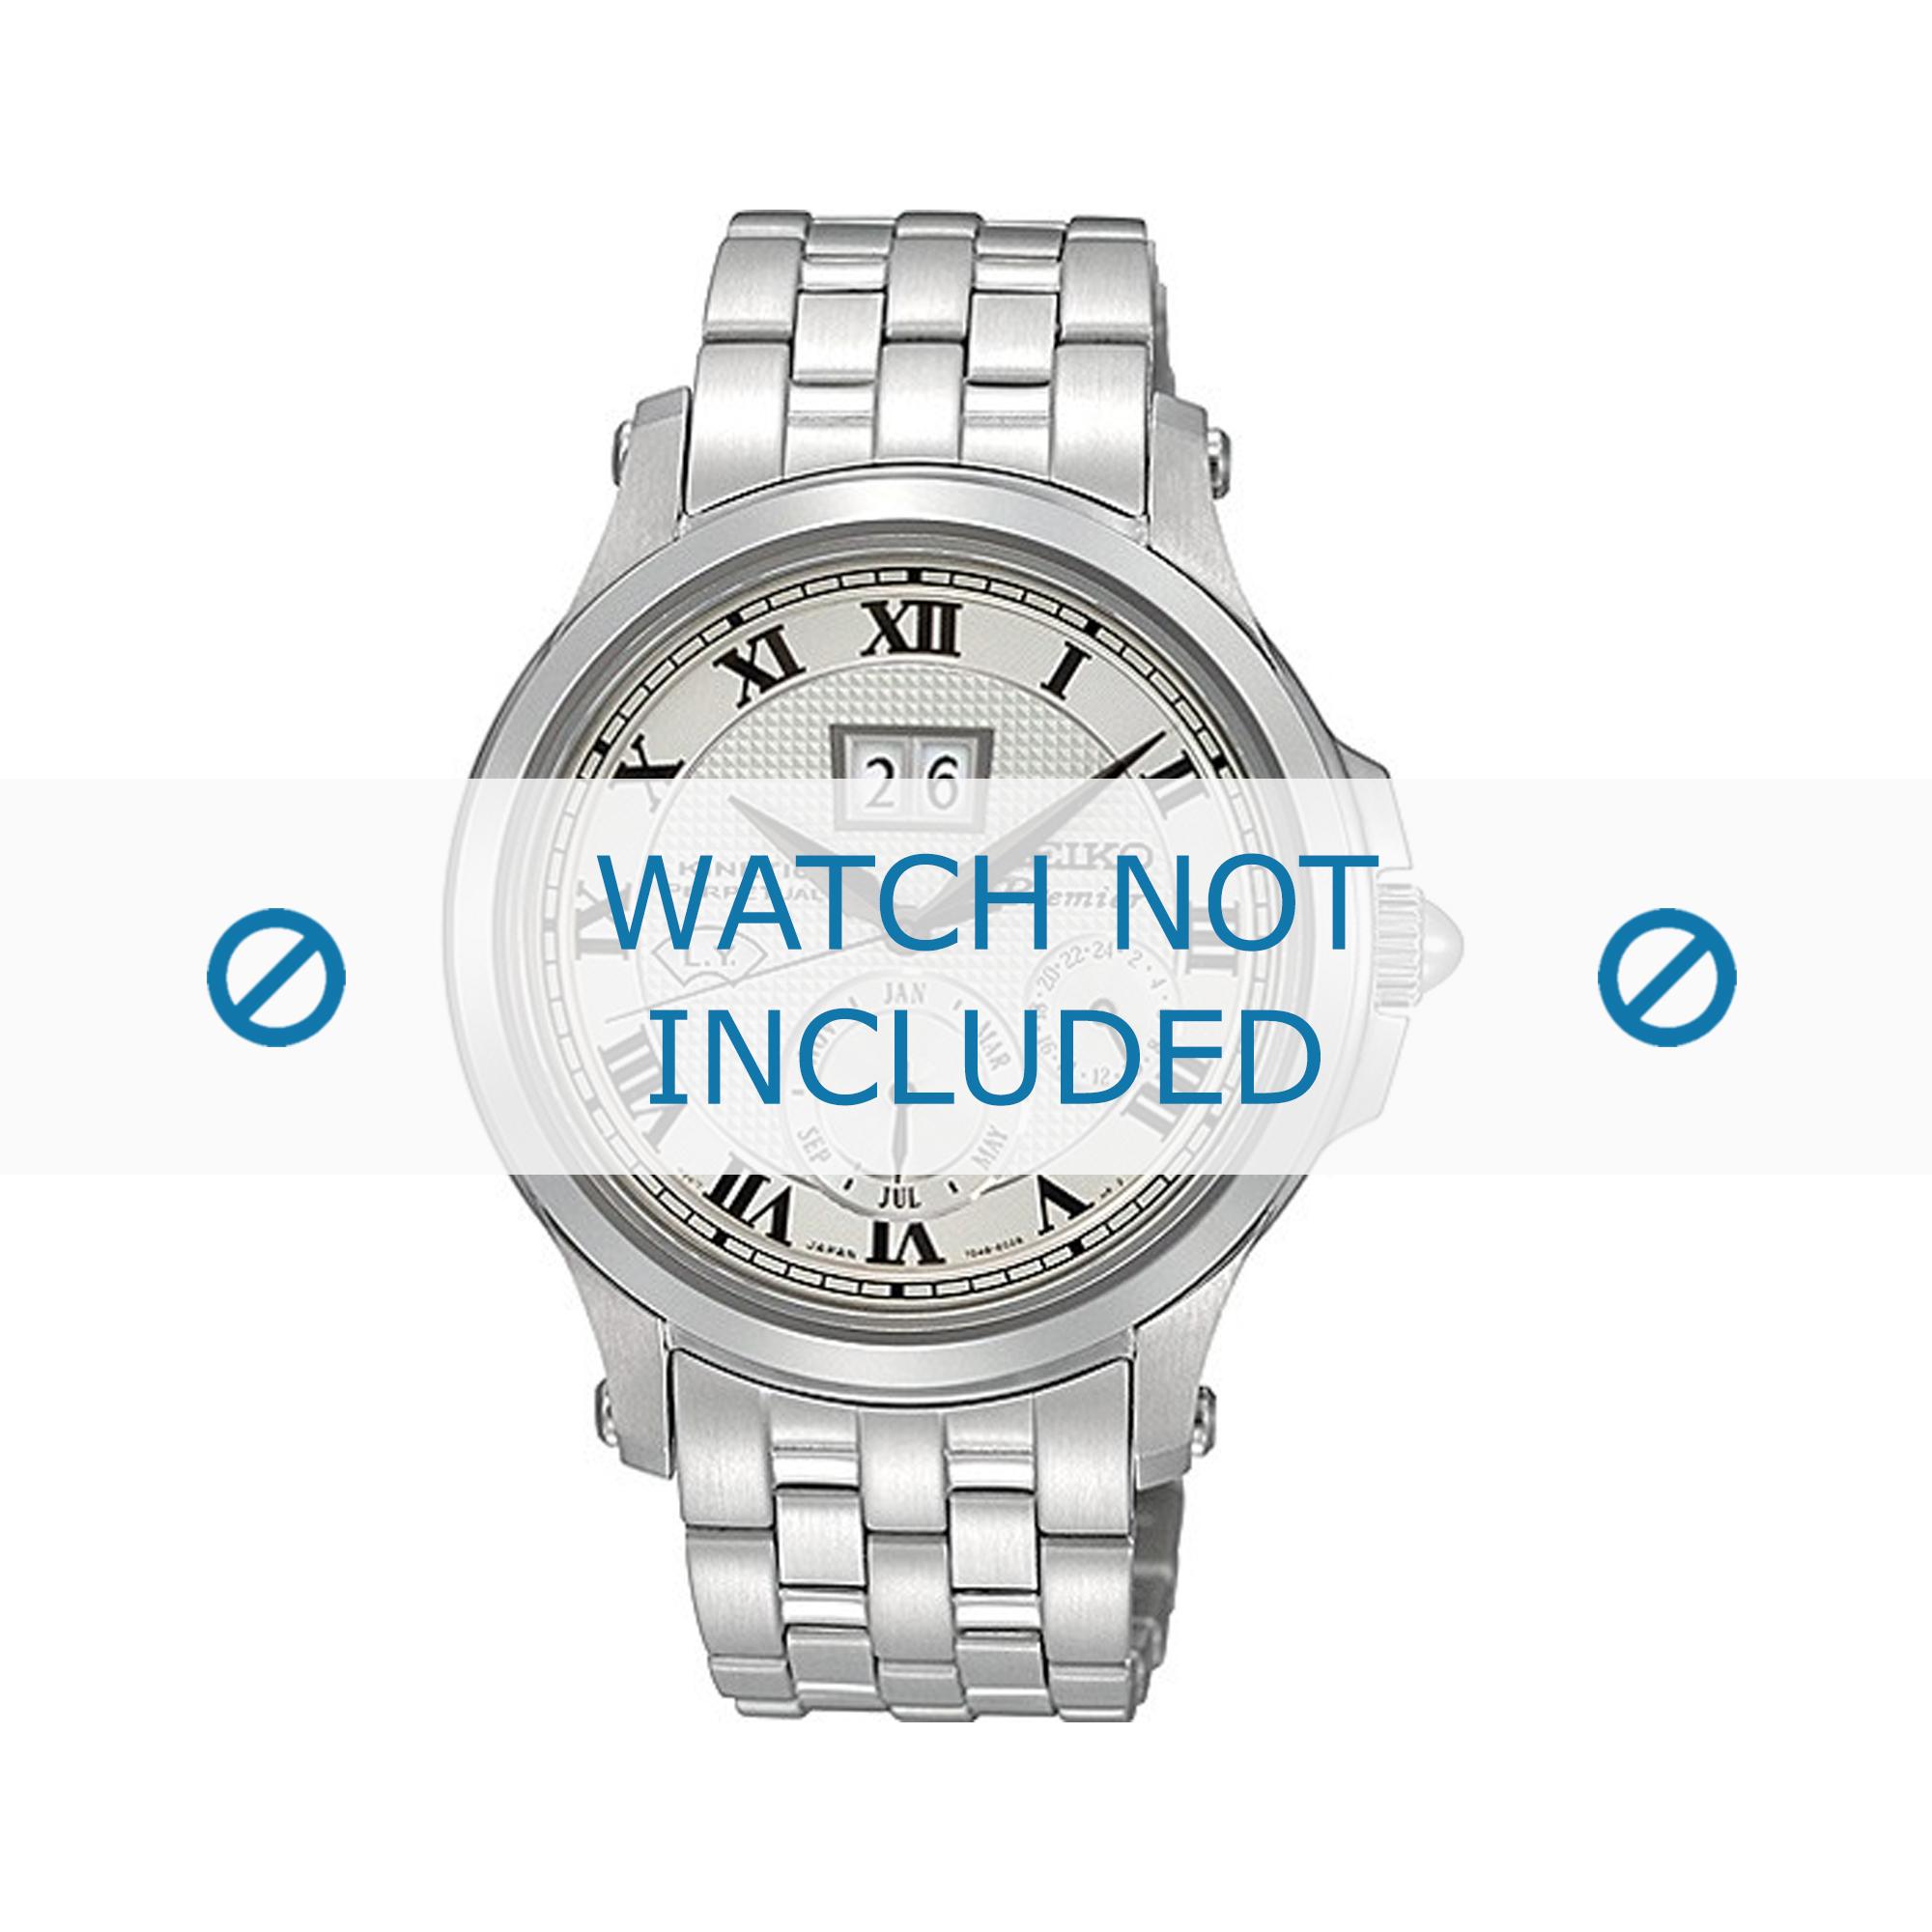 Seiko horlogeband SNP039P1 / 7D48-0AG0 01B / M0NB111J0 Staal Zilver 20mm